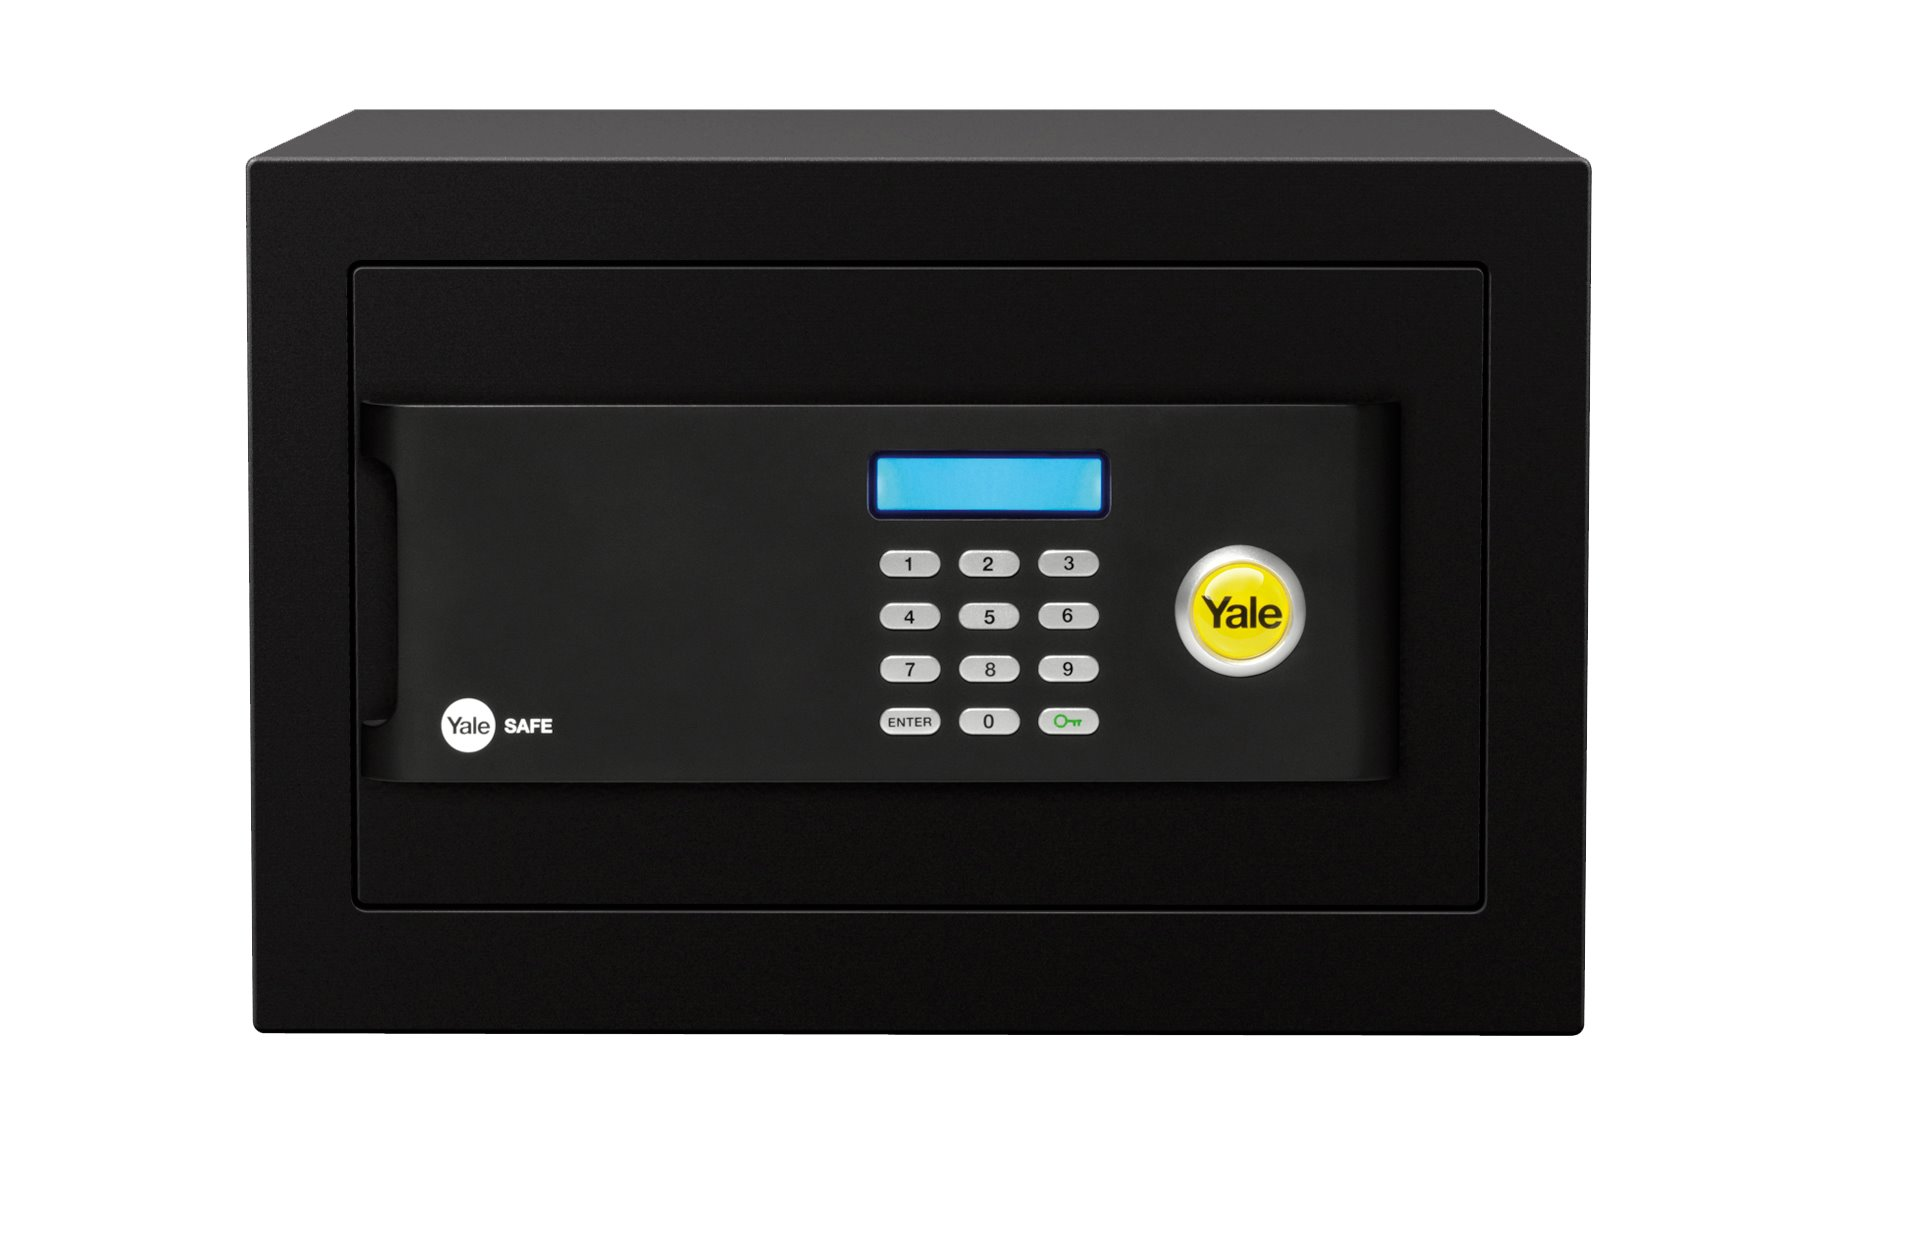 YSB/200/EB1 - Compact safe